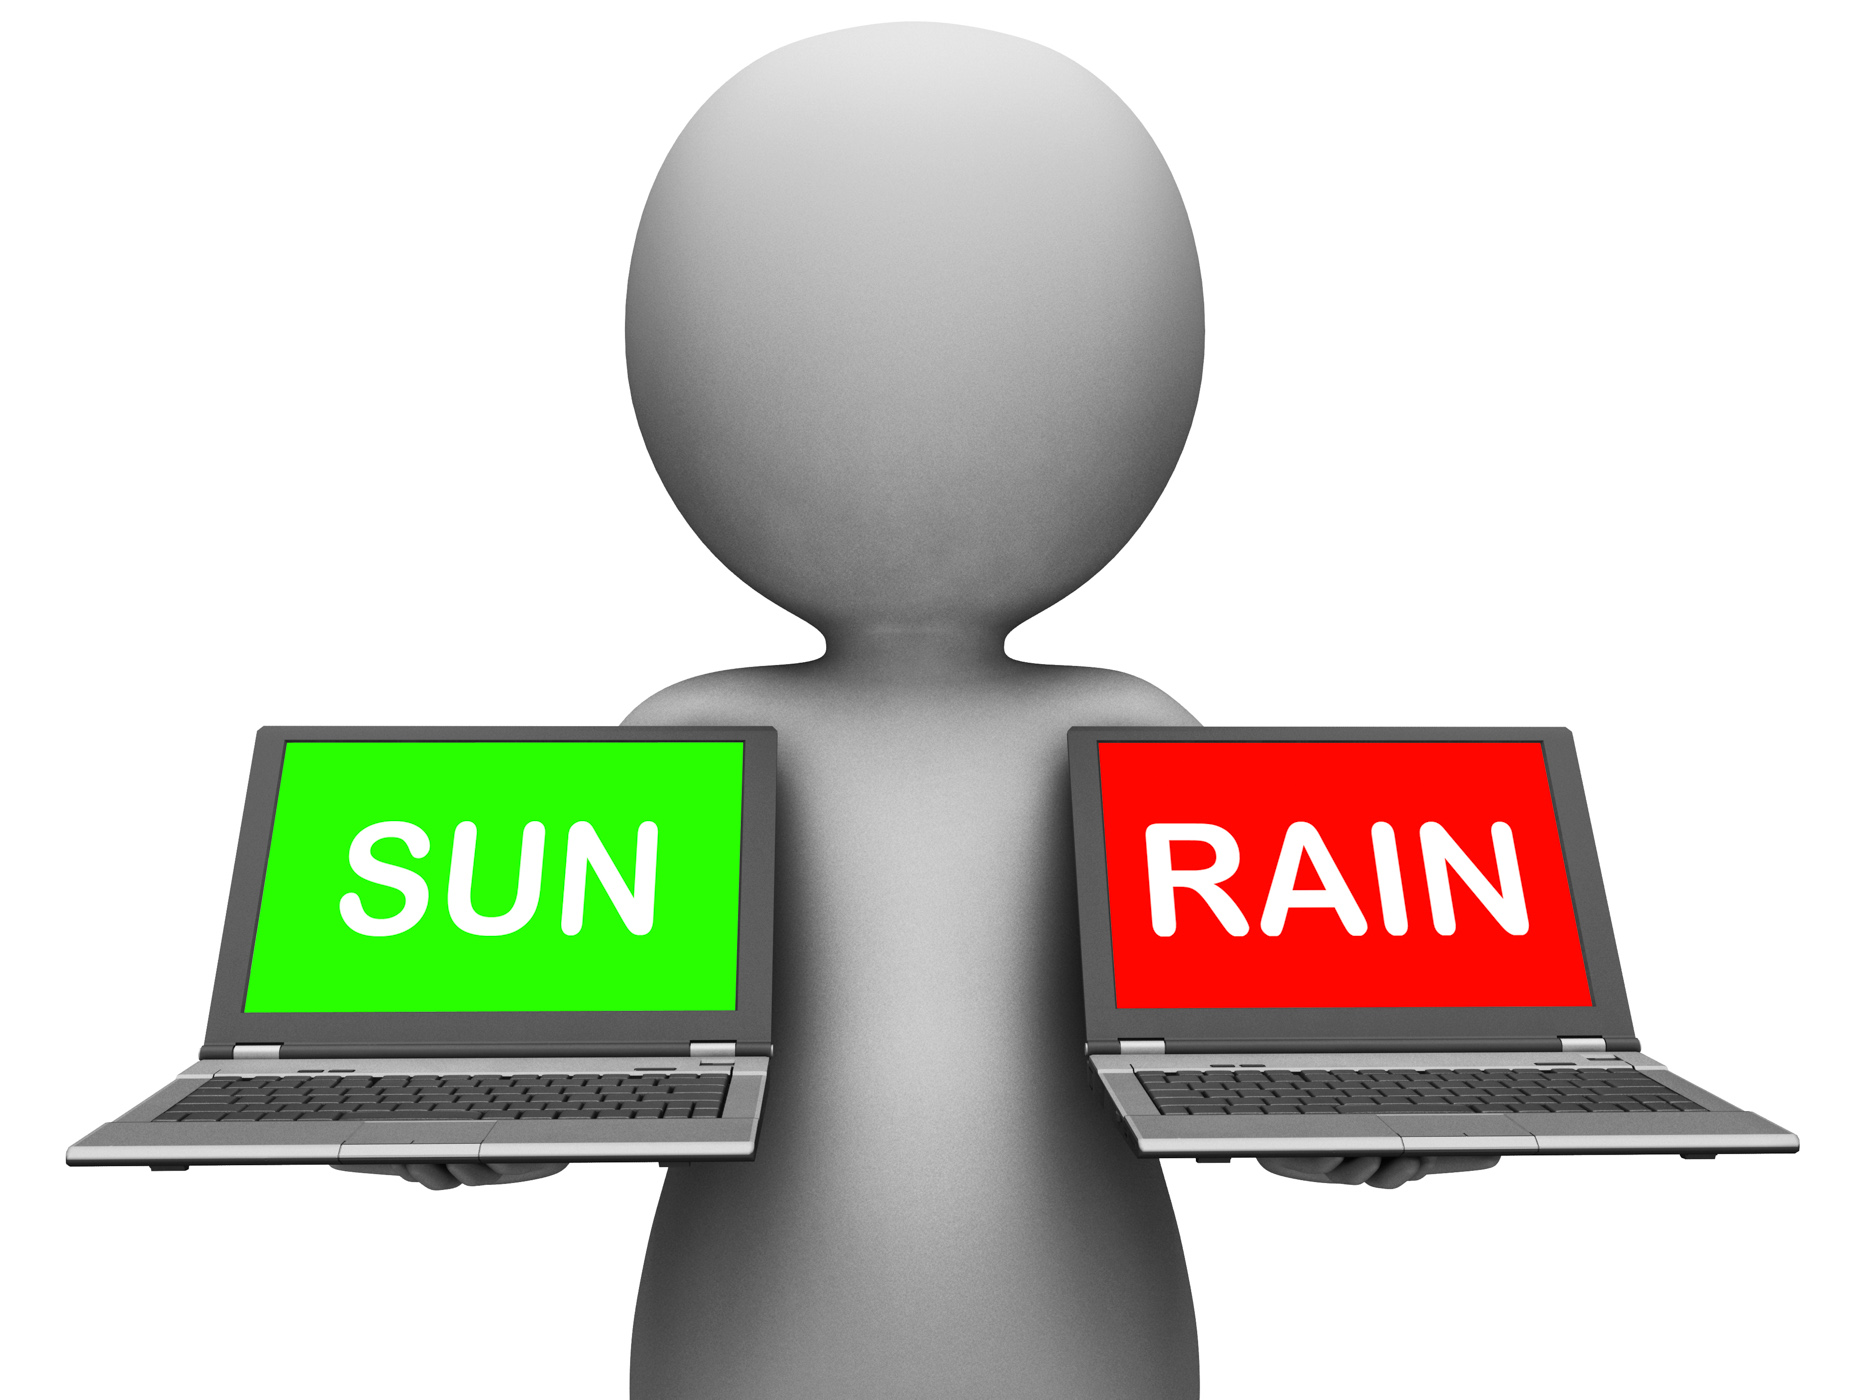 Sun rain laptops shows weather forecast sunny or raining photo